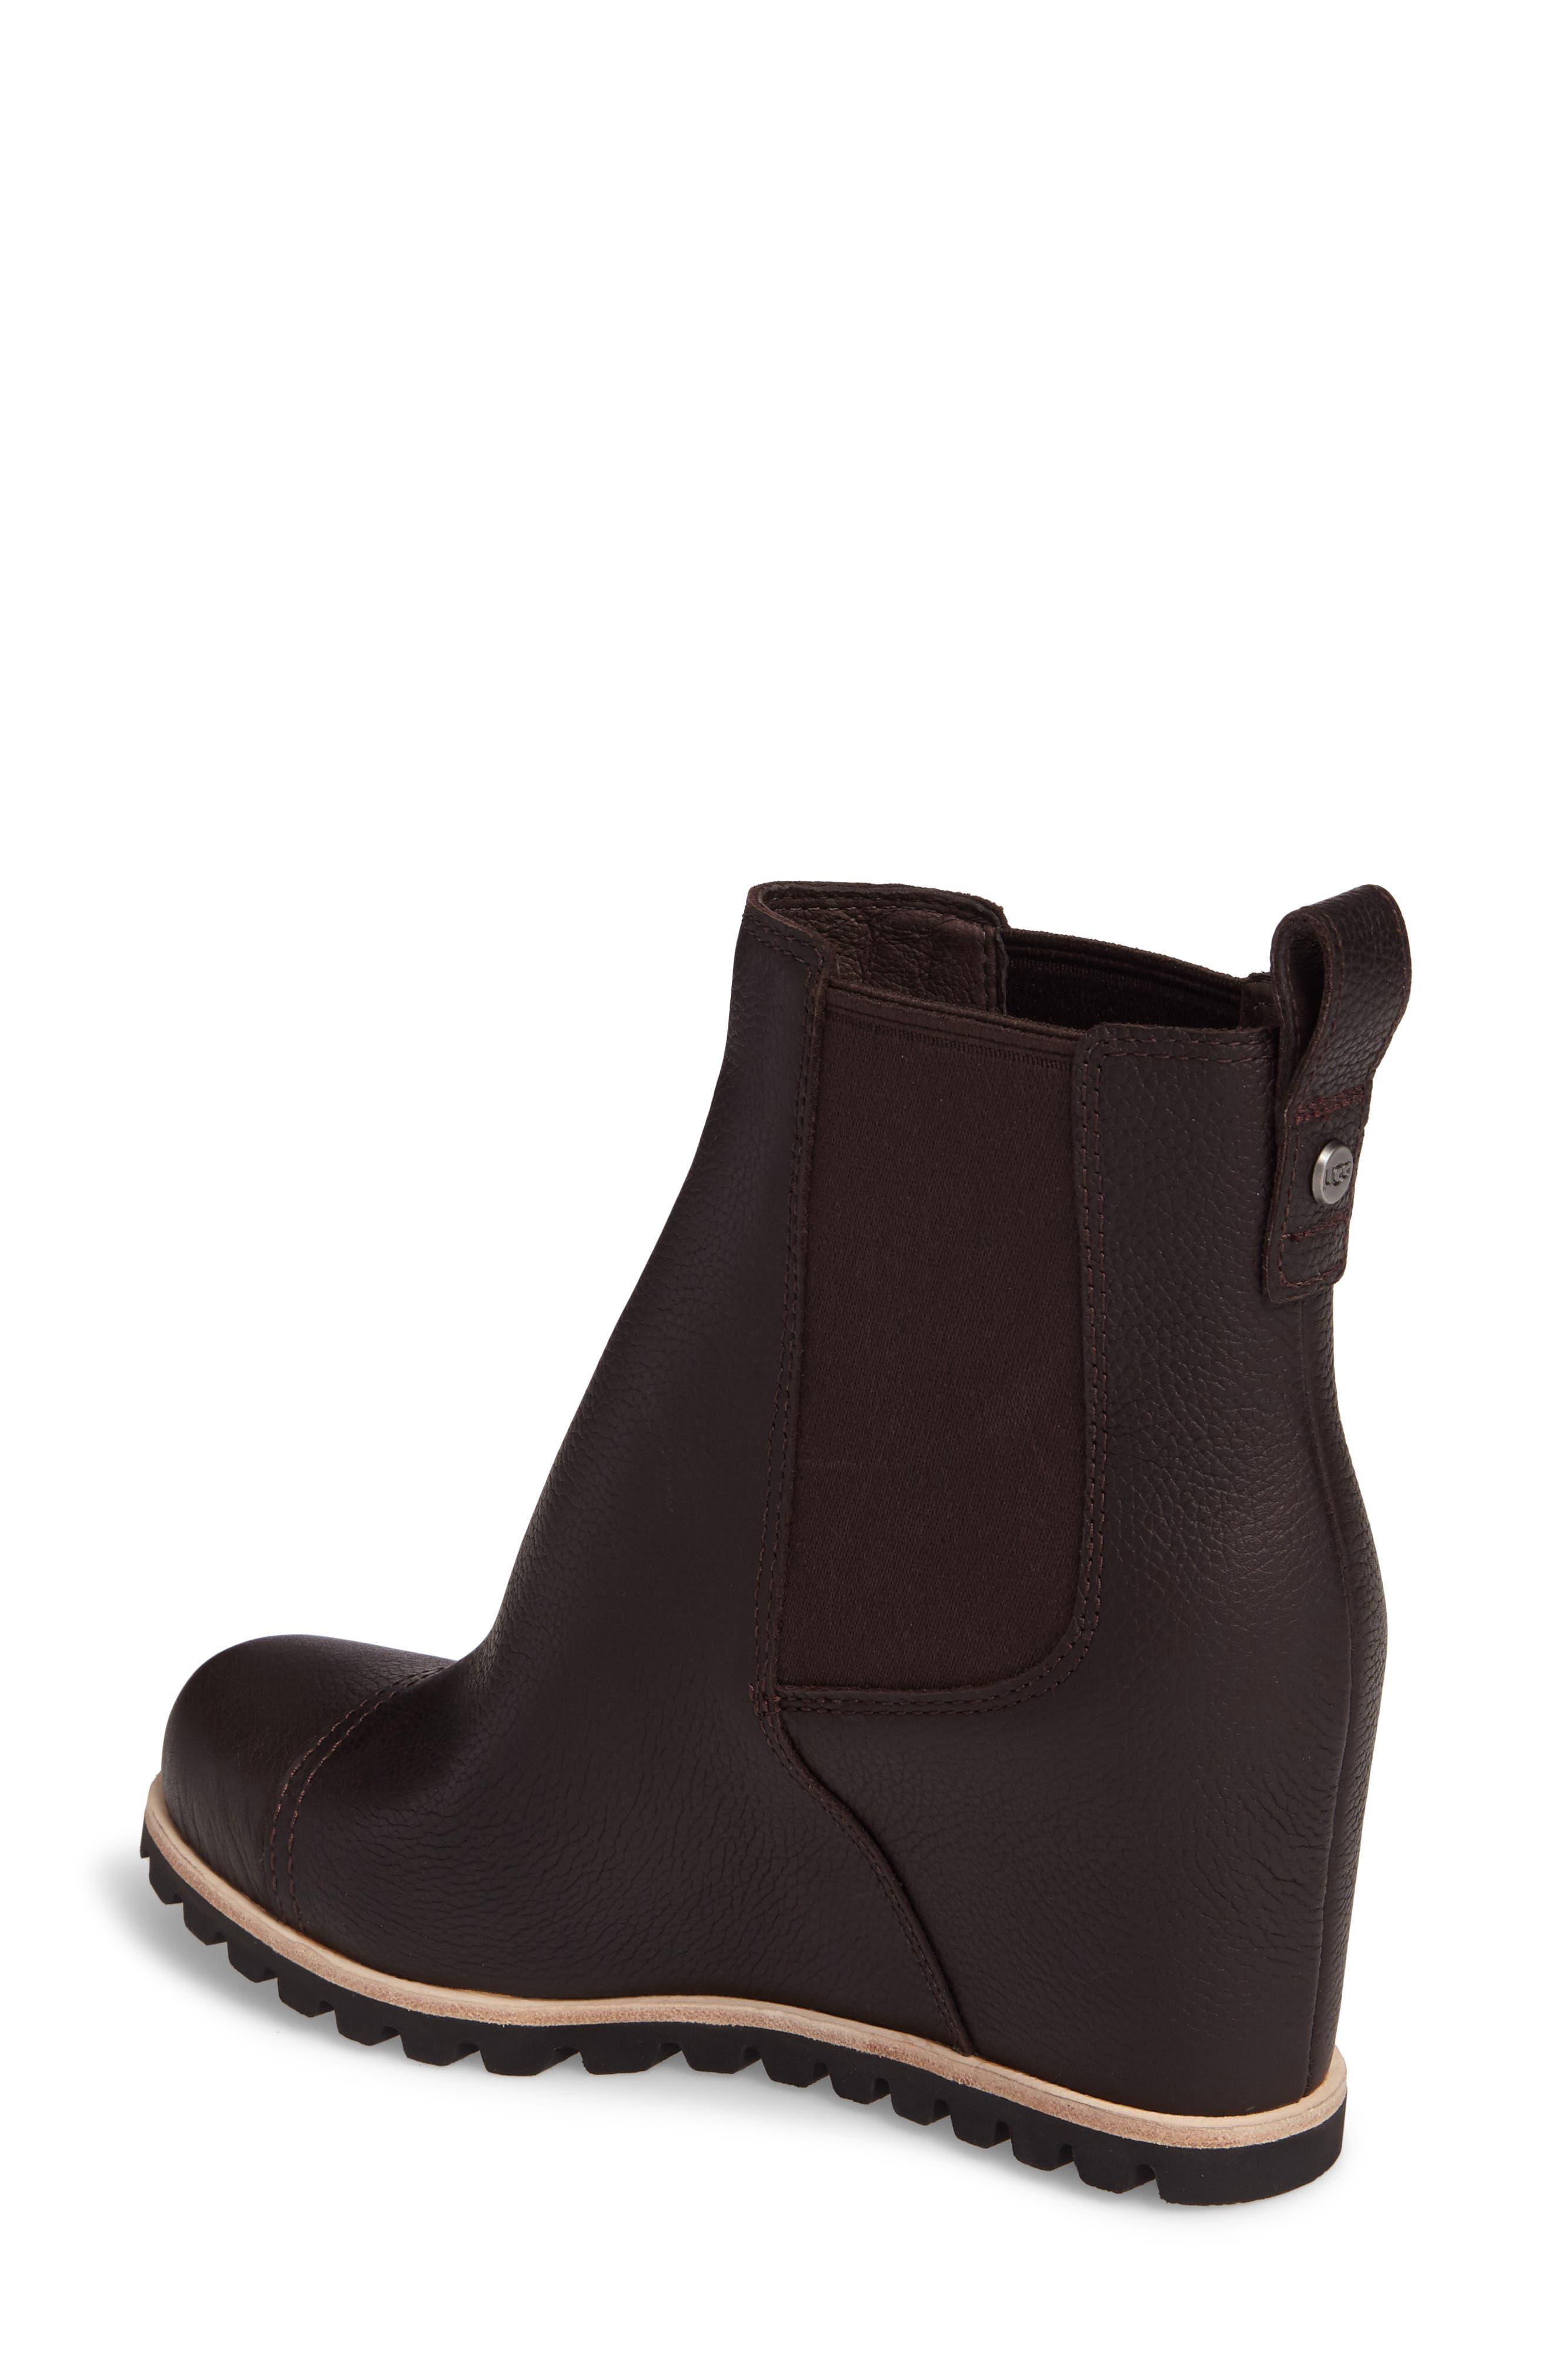 Pax Waterproof Wedge Boot,                             Alternate thumbnail 4, color,